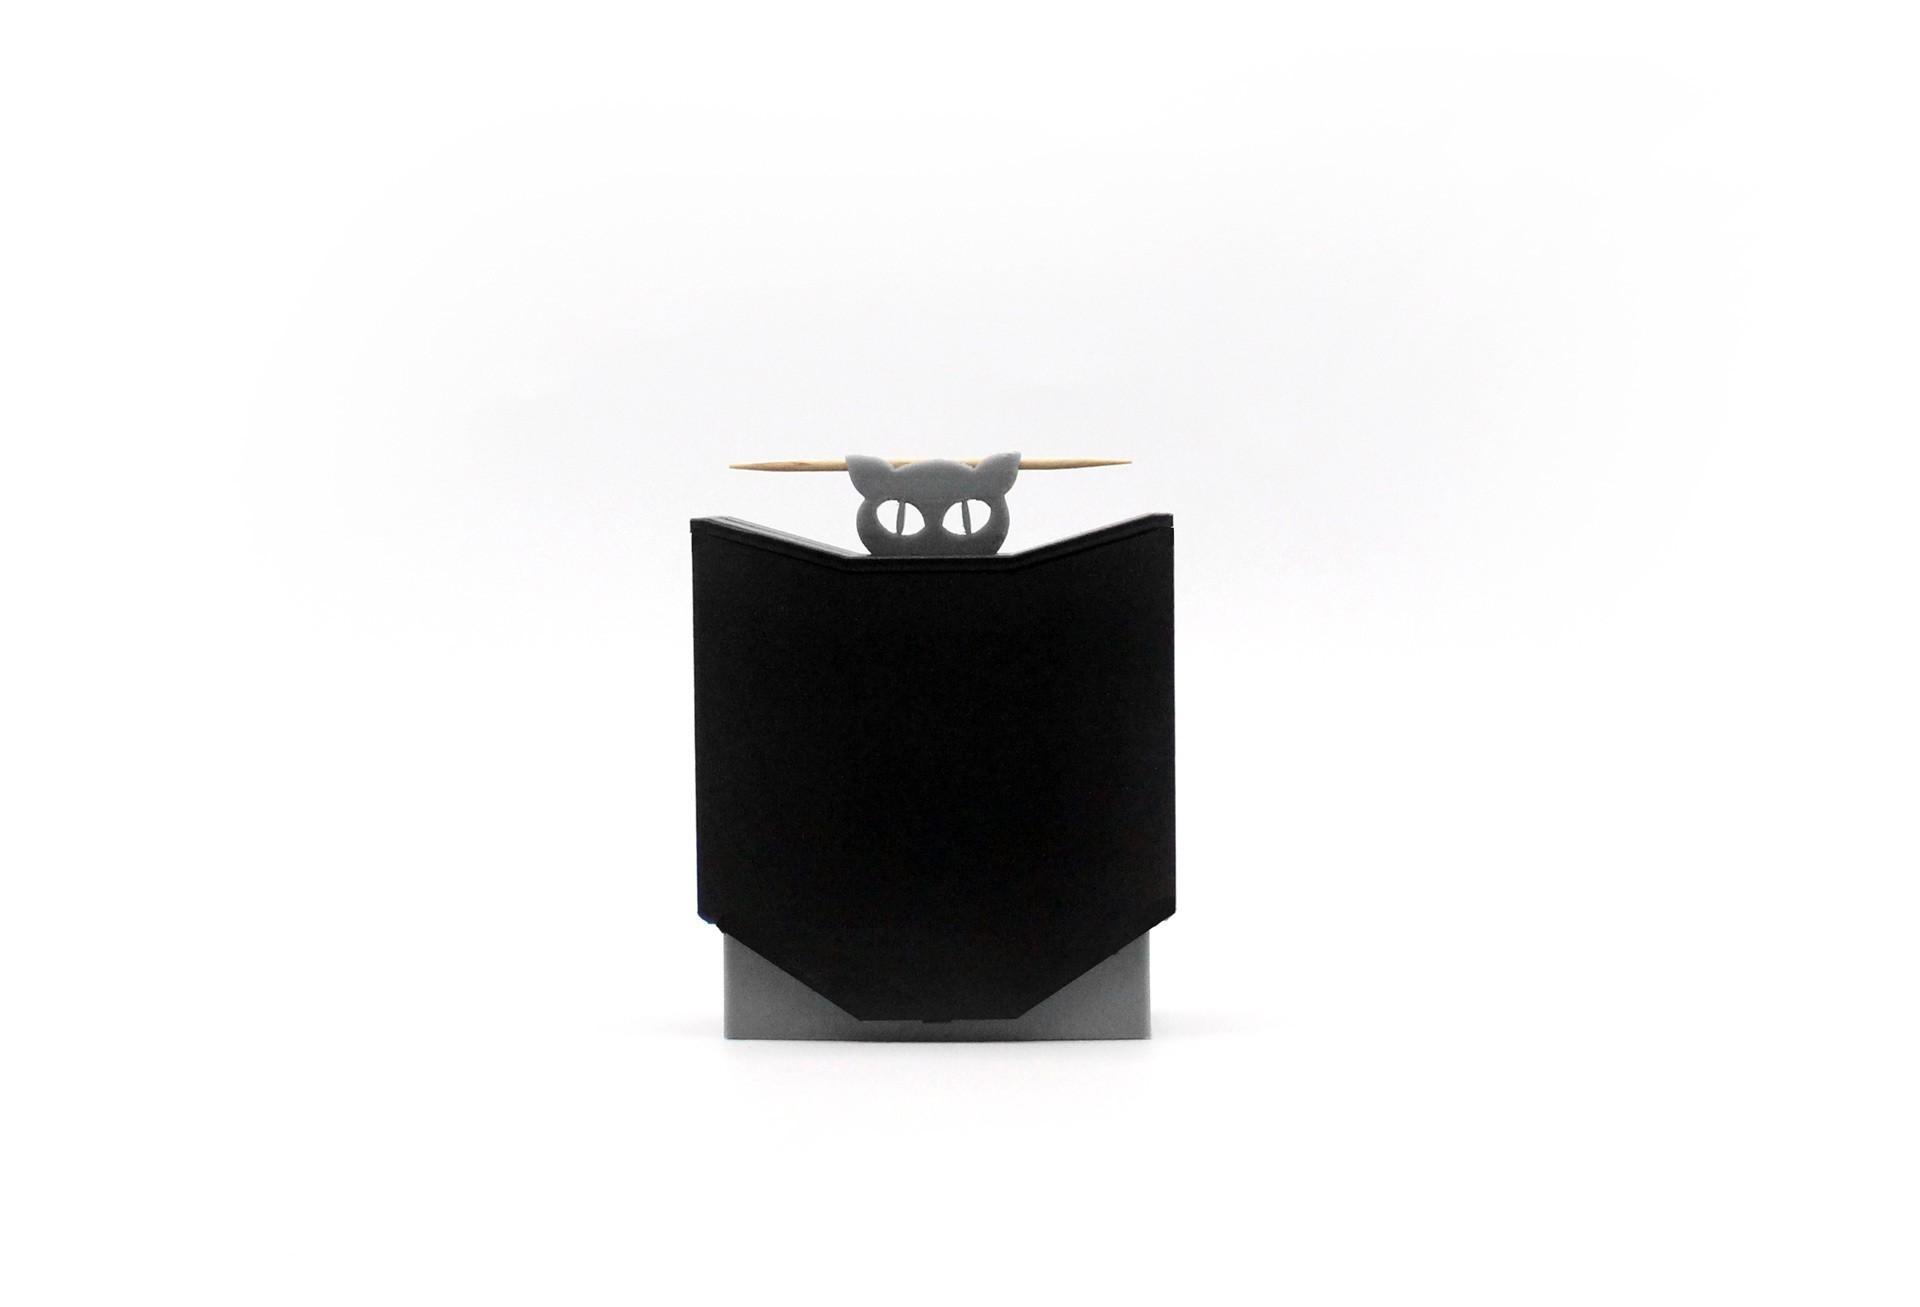 boite_magique_curedent_3dpocket_3.jpg Download STL file Magic toothpick dispenser • Object to 3D print, ffmicka